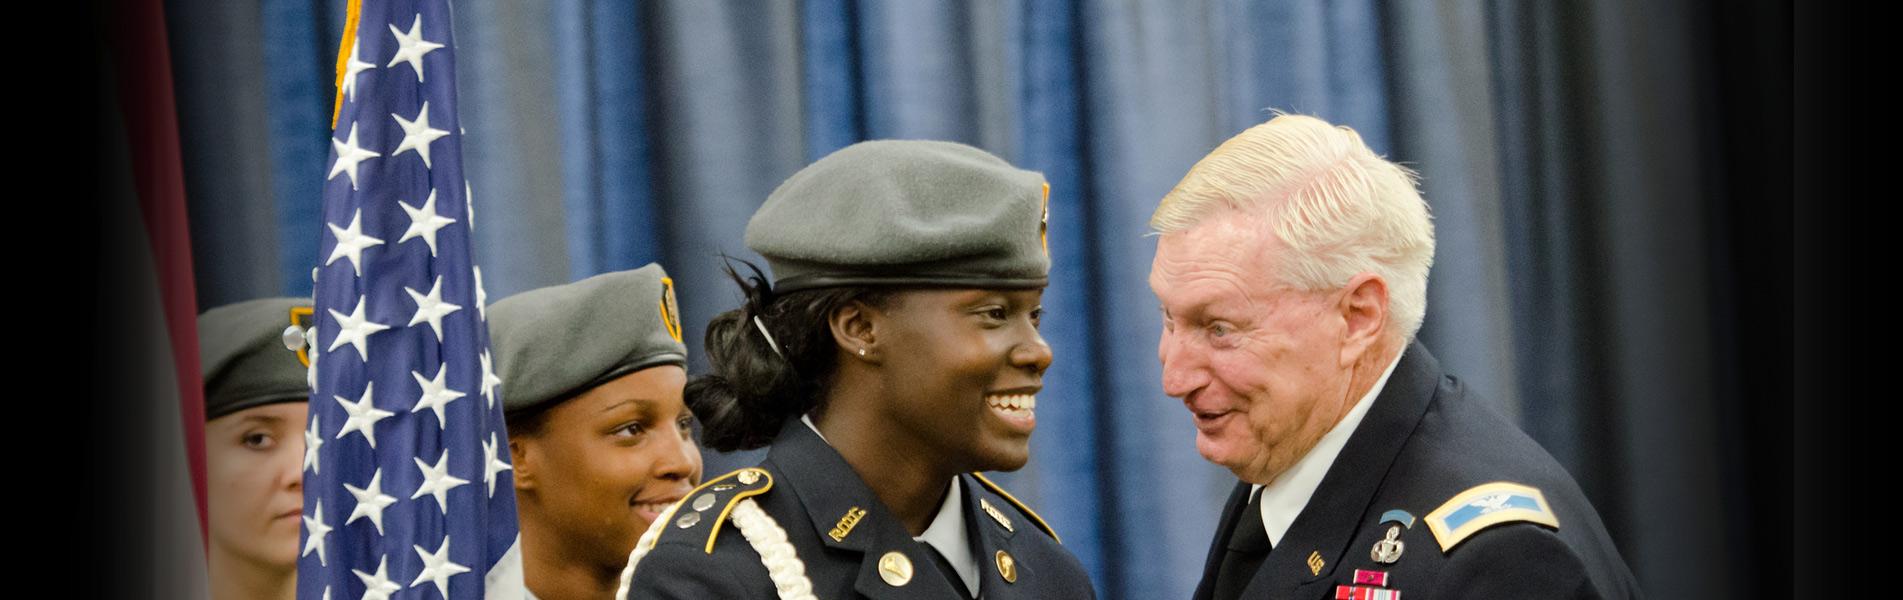 FGCU honors veterans